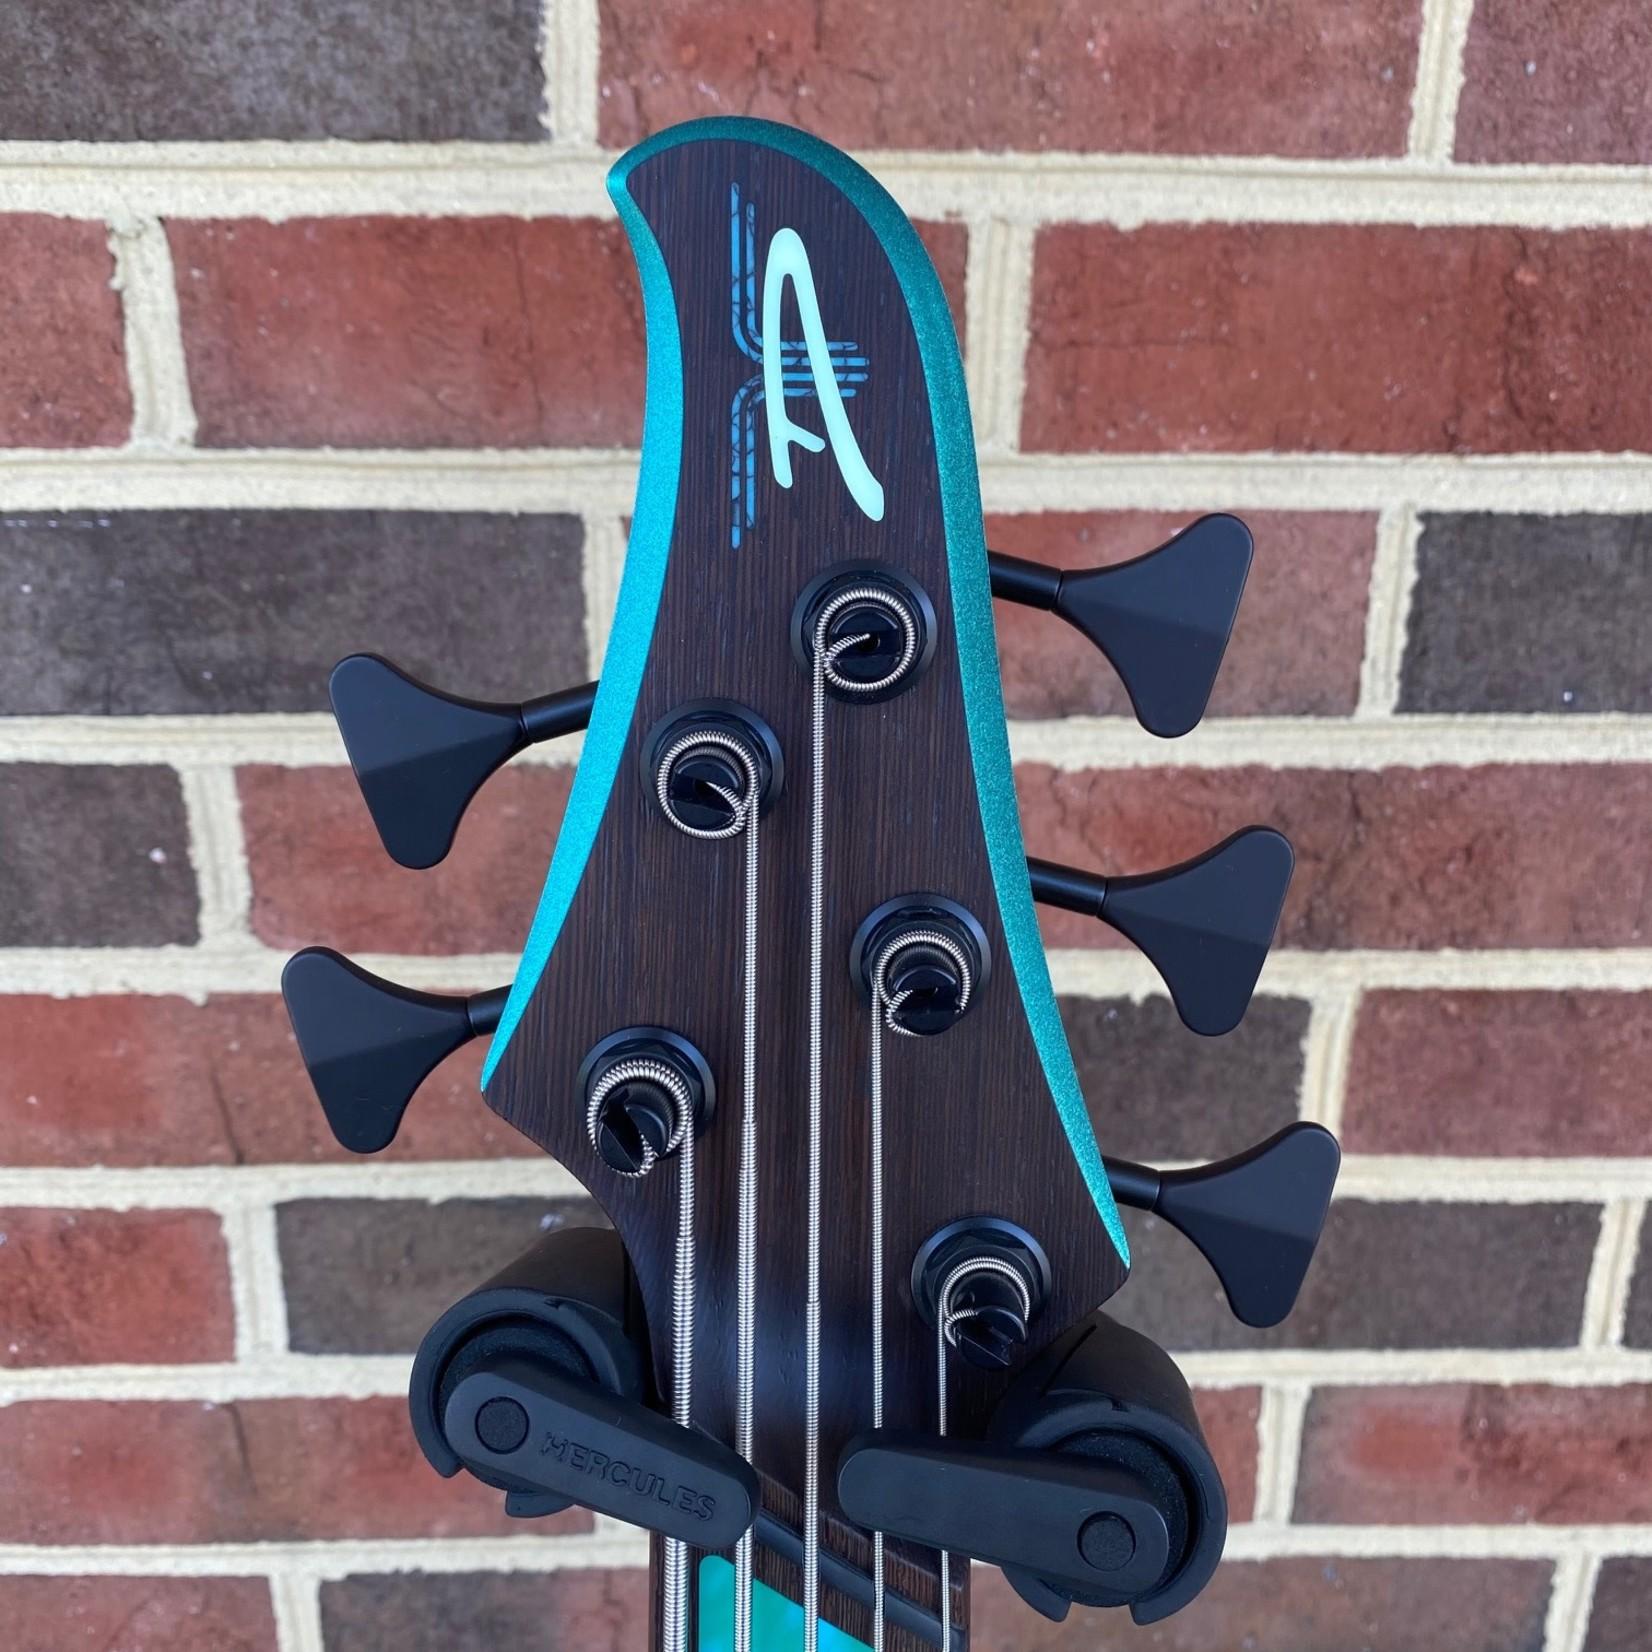 Dingwall Dingwall D-Roc Custom 5-String, Sage Green to Ice Blue Colorshift, Maple Neck, Wenge Fretboard, Marine Pearloid Block Inlays, Black Hardware, Dingwall Gig Bag